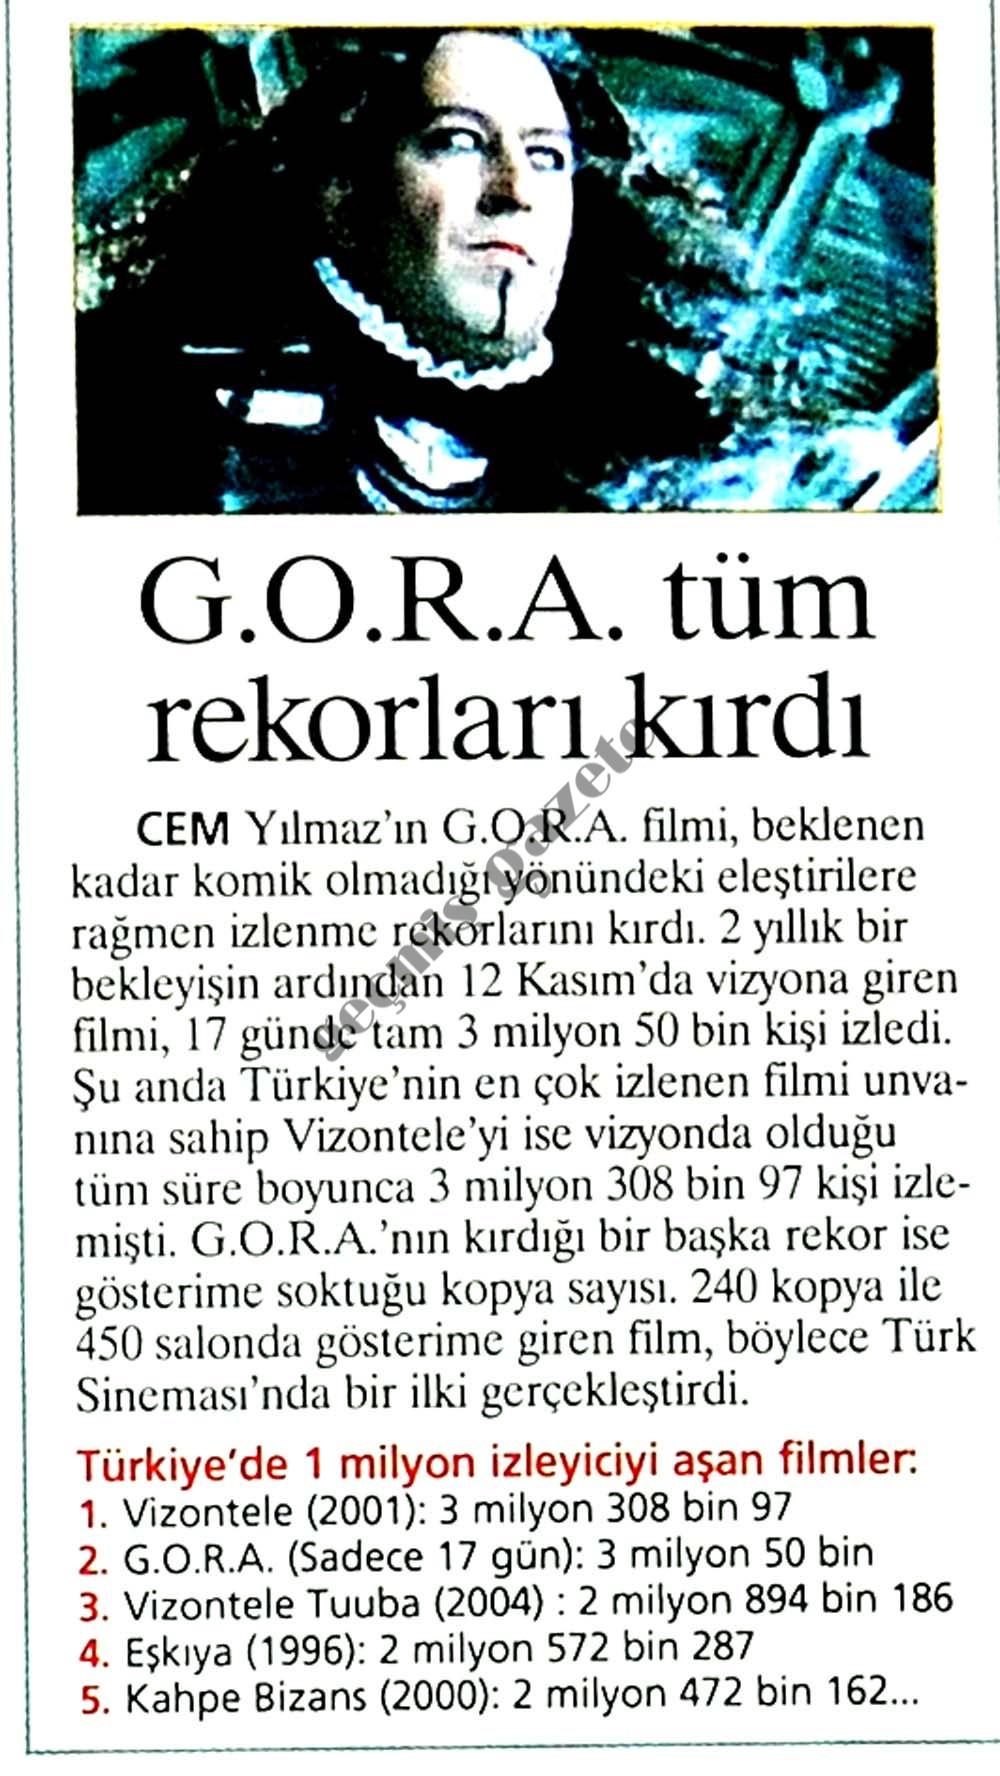 G.O.R.A. tüm rekorları kırdı